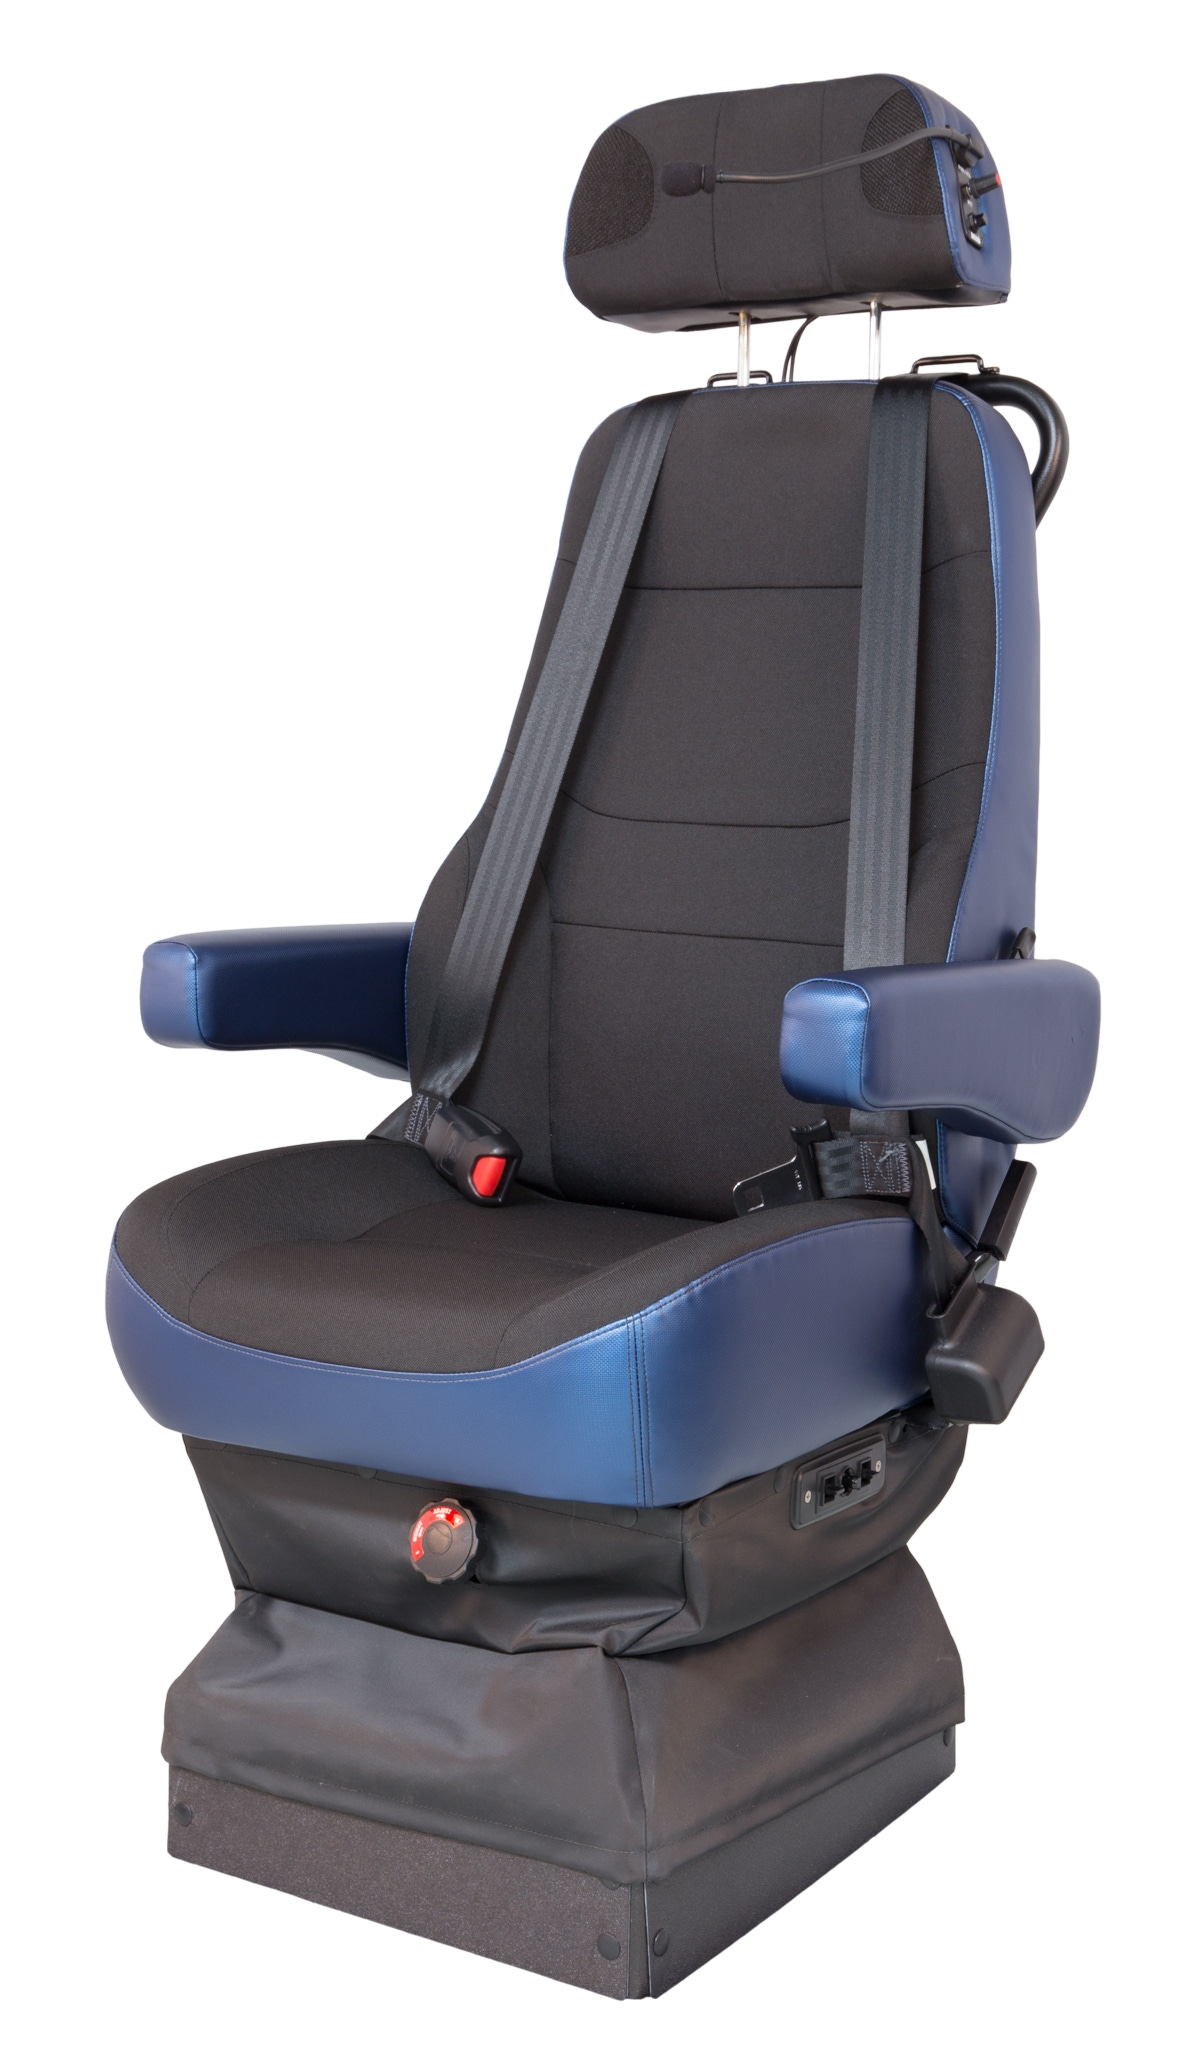 black pedestals adjustable marine fishing seat base chair itm new height swivel boat pedestal